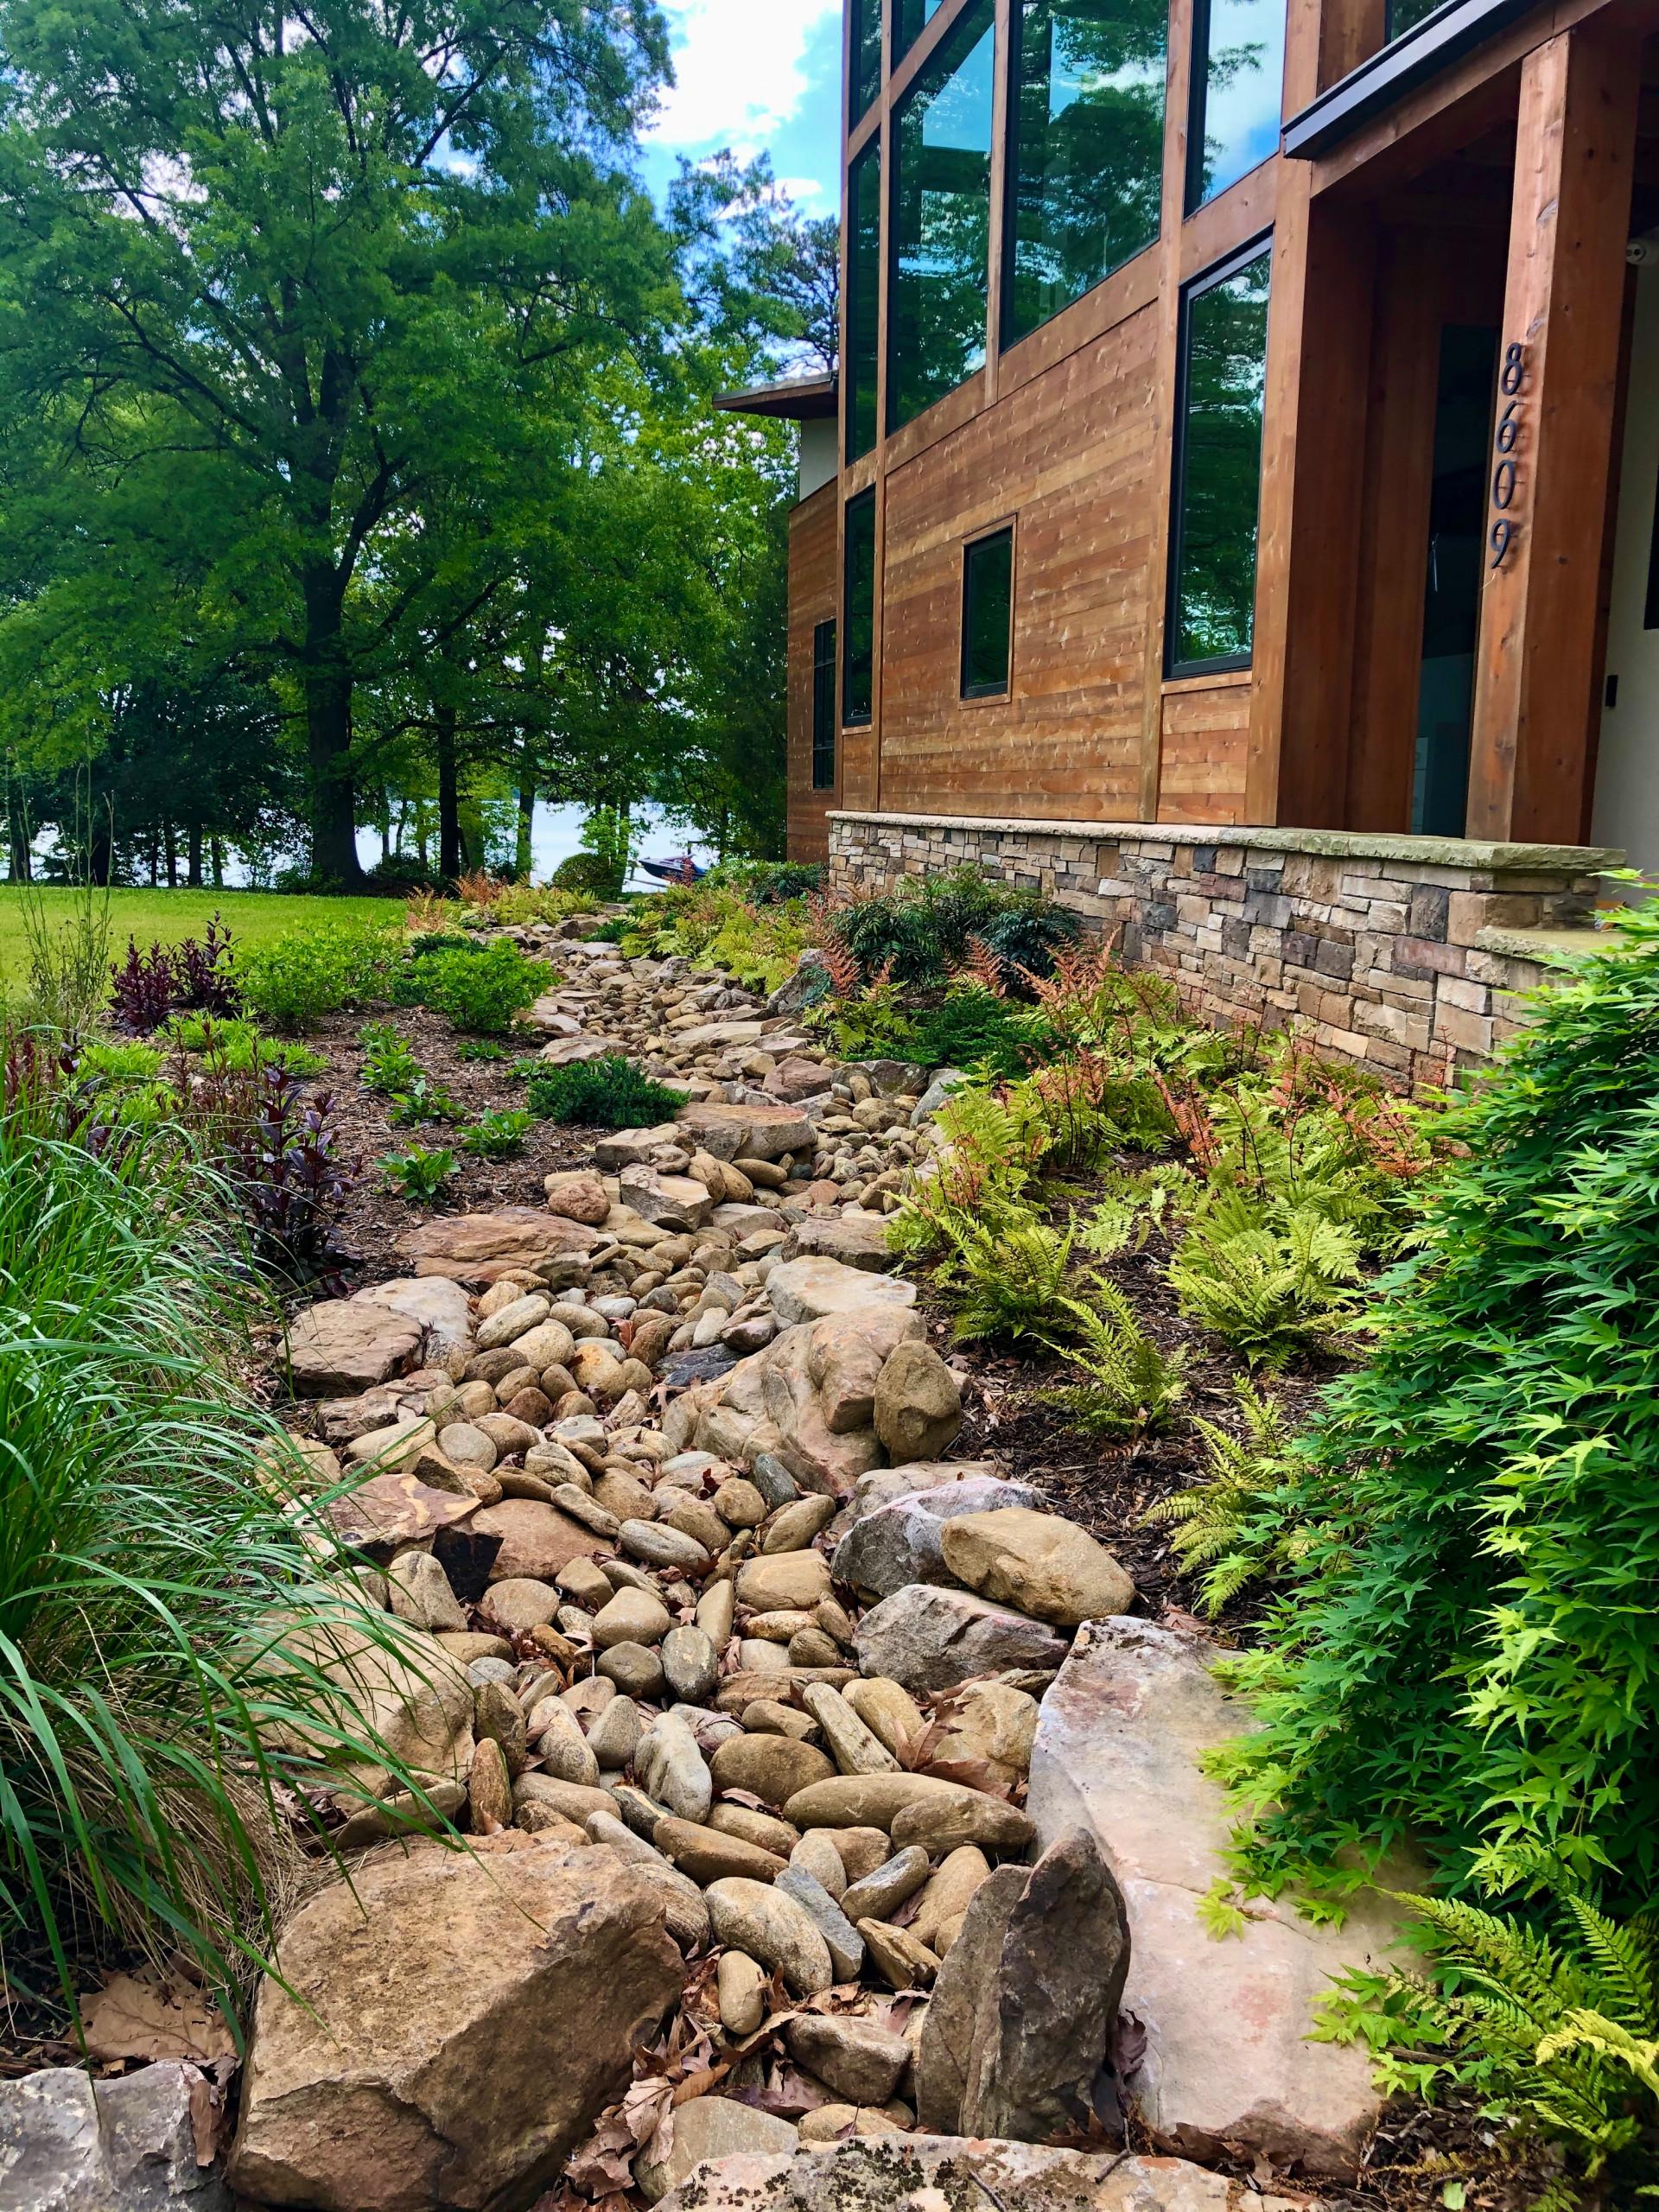 Lake-side creek bed